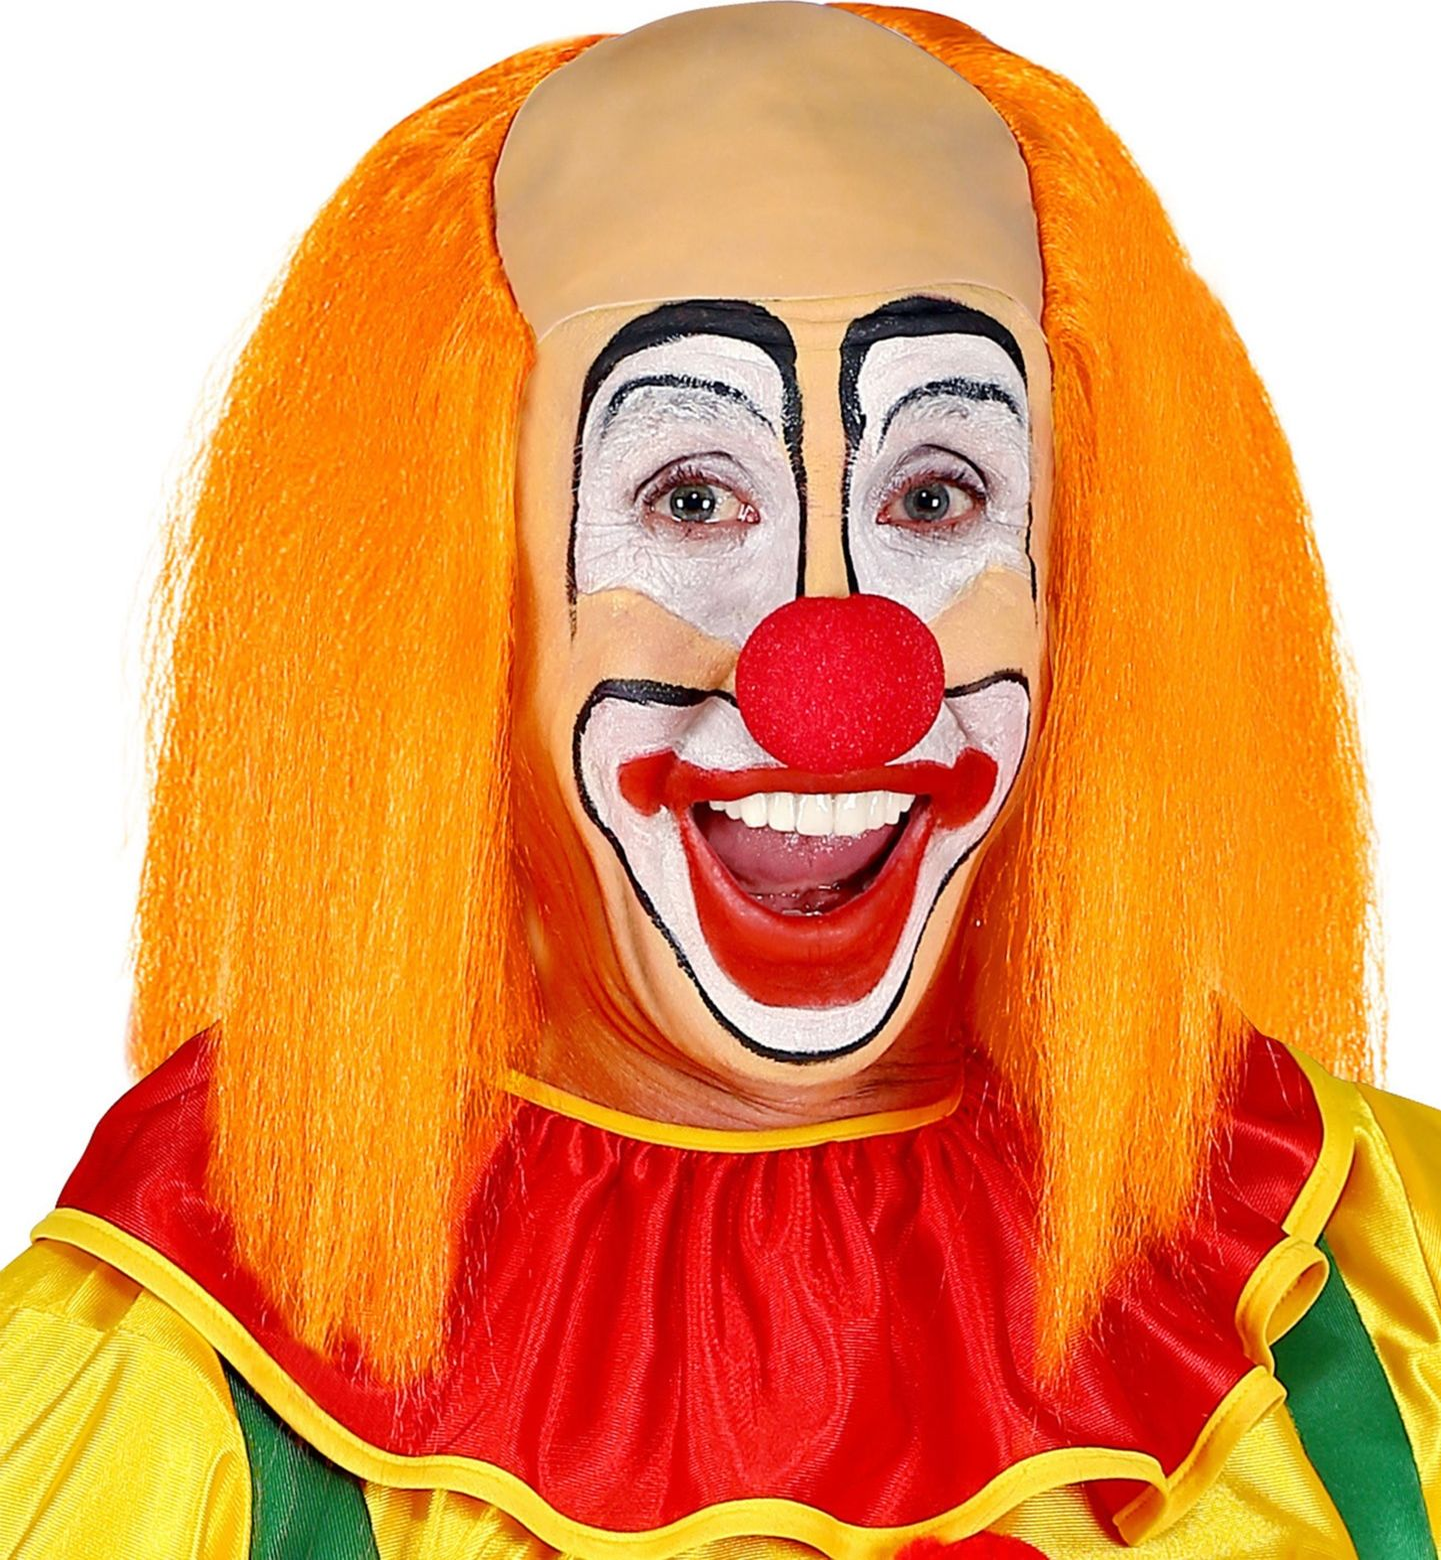 Kale clown pruik met oranje haar